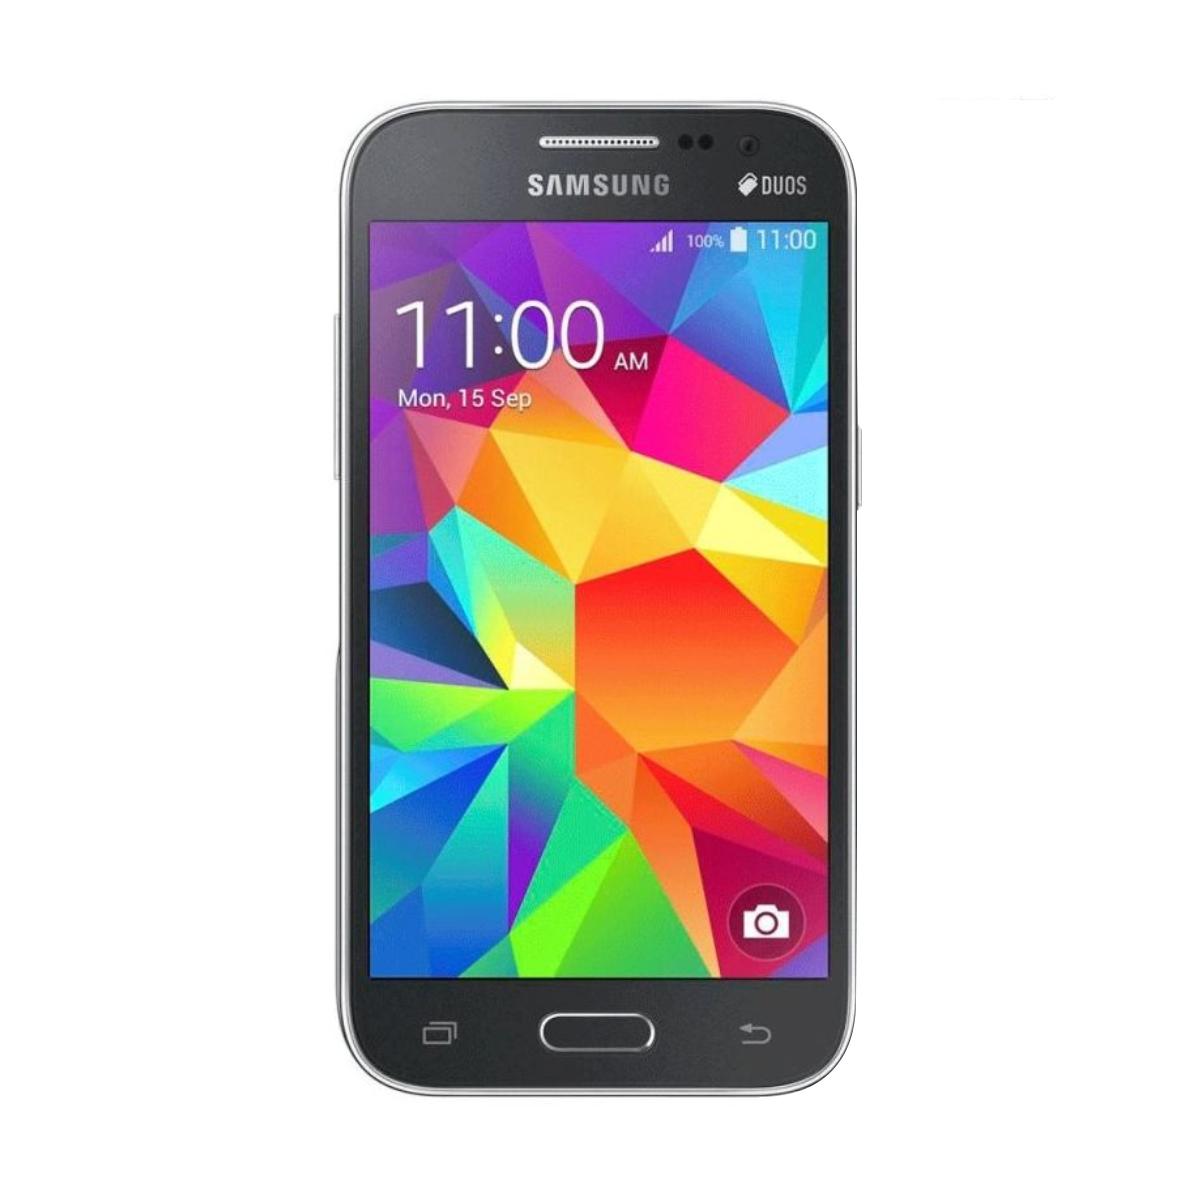 Samsung Galaxy Win 2 Duos 4g G360 8gb Tela 4.5' - Seminovo